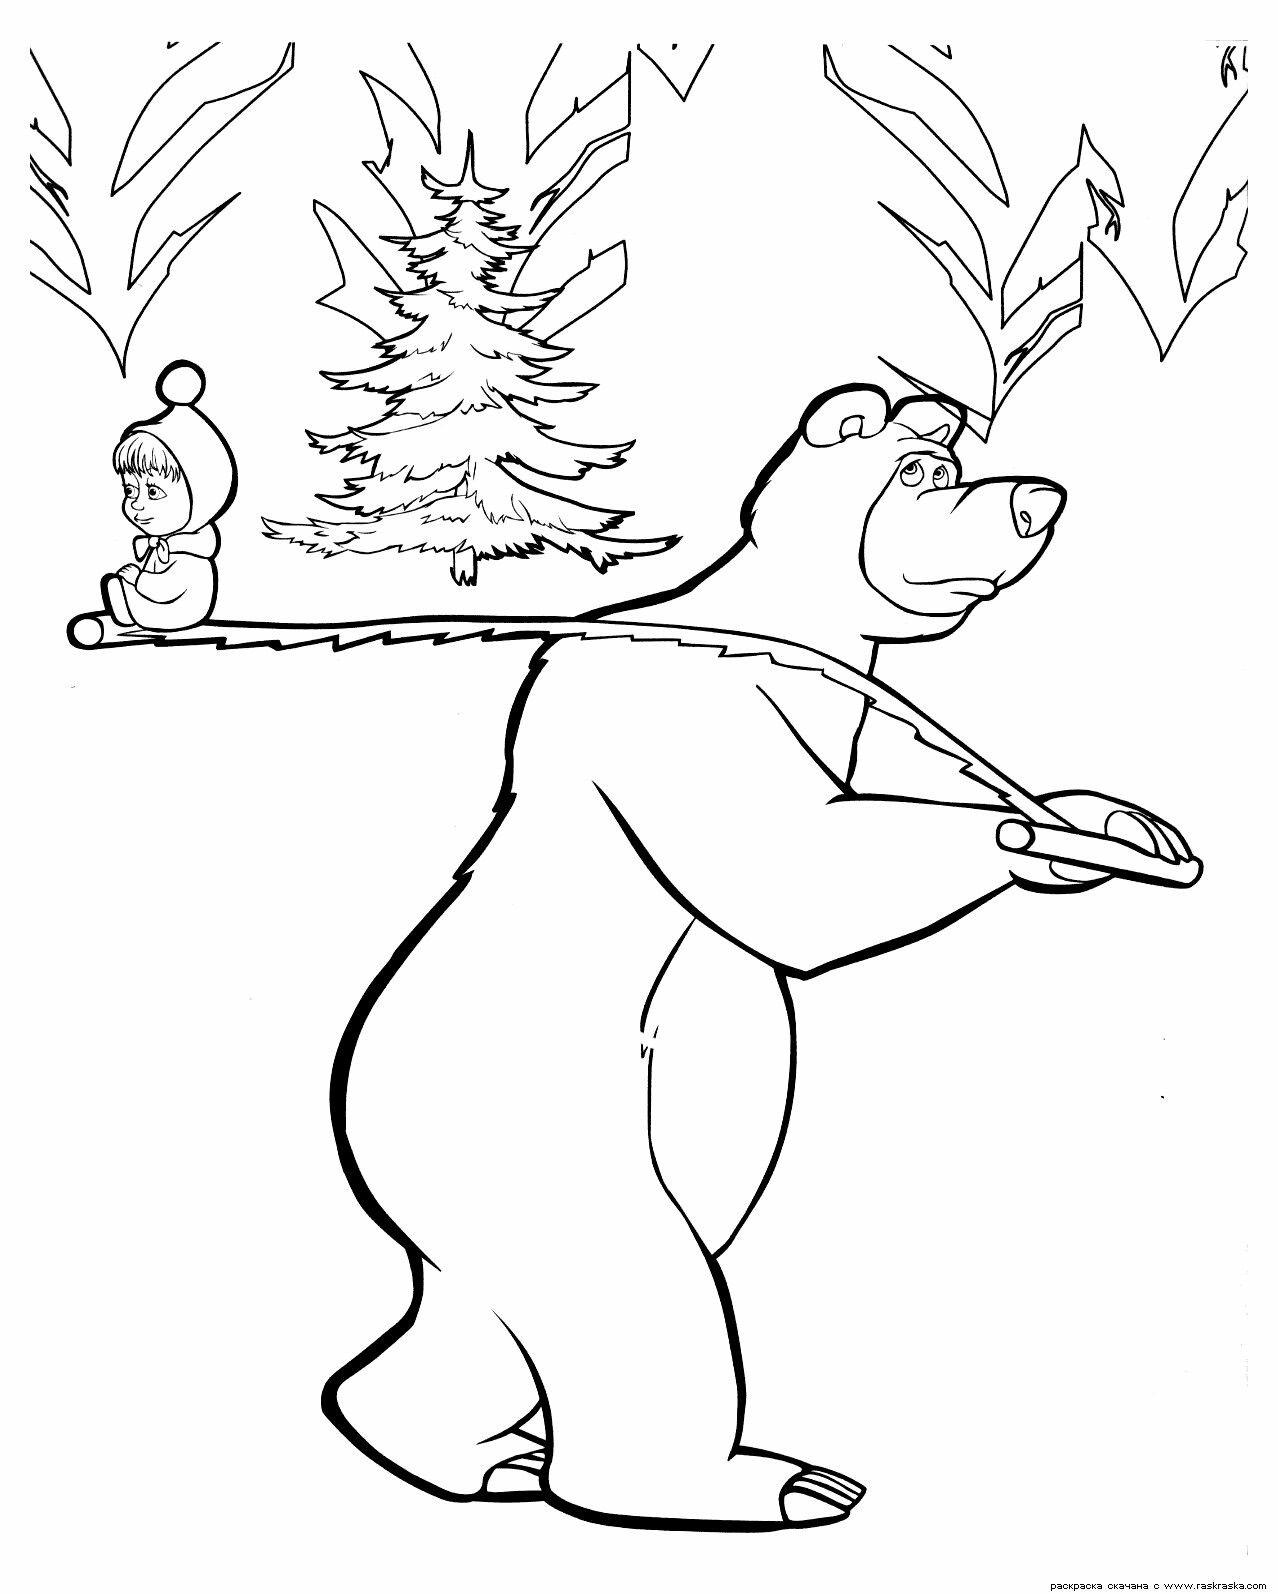 Pin by KONPANYA KARTOONS on masha y el oso para colorear | Pinterest